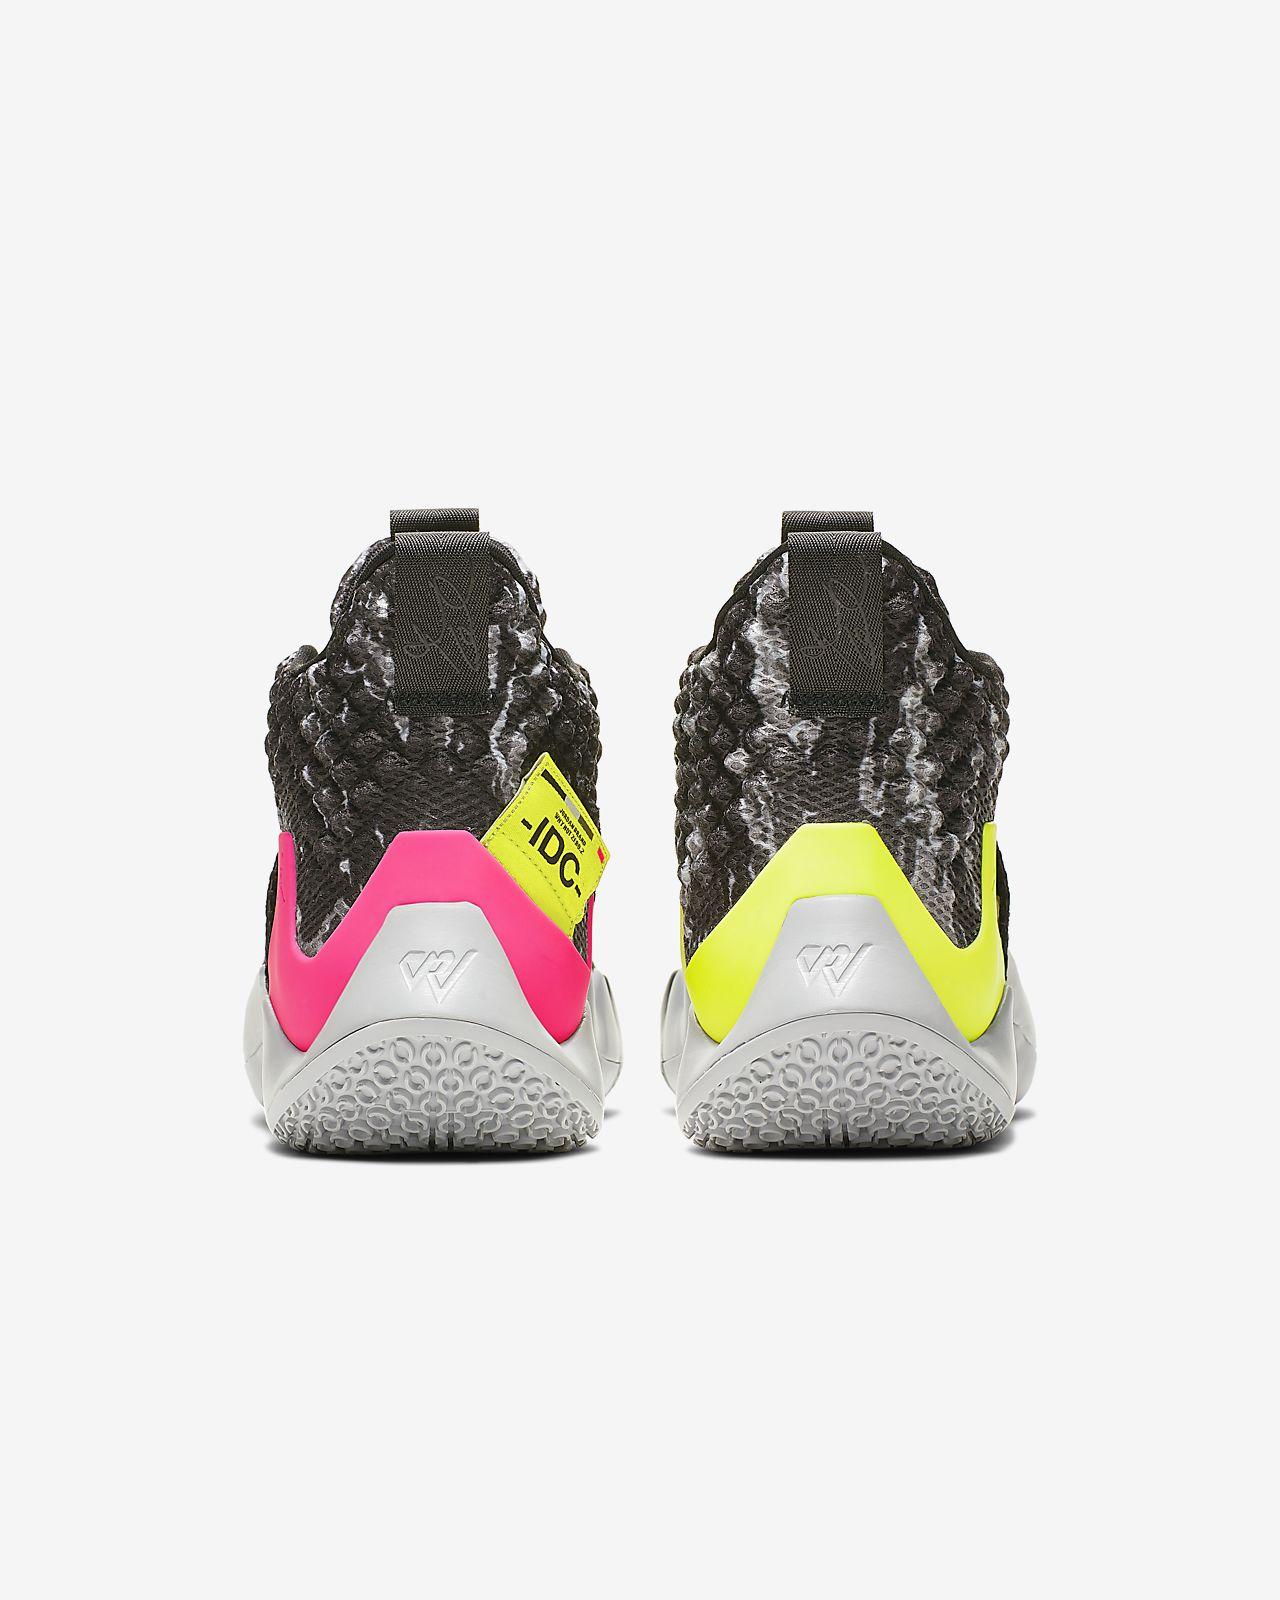 new concept e49bd bcb50 Zer0.2 Basketball Shoe Jordan